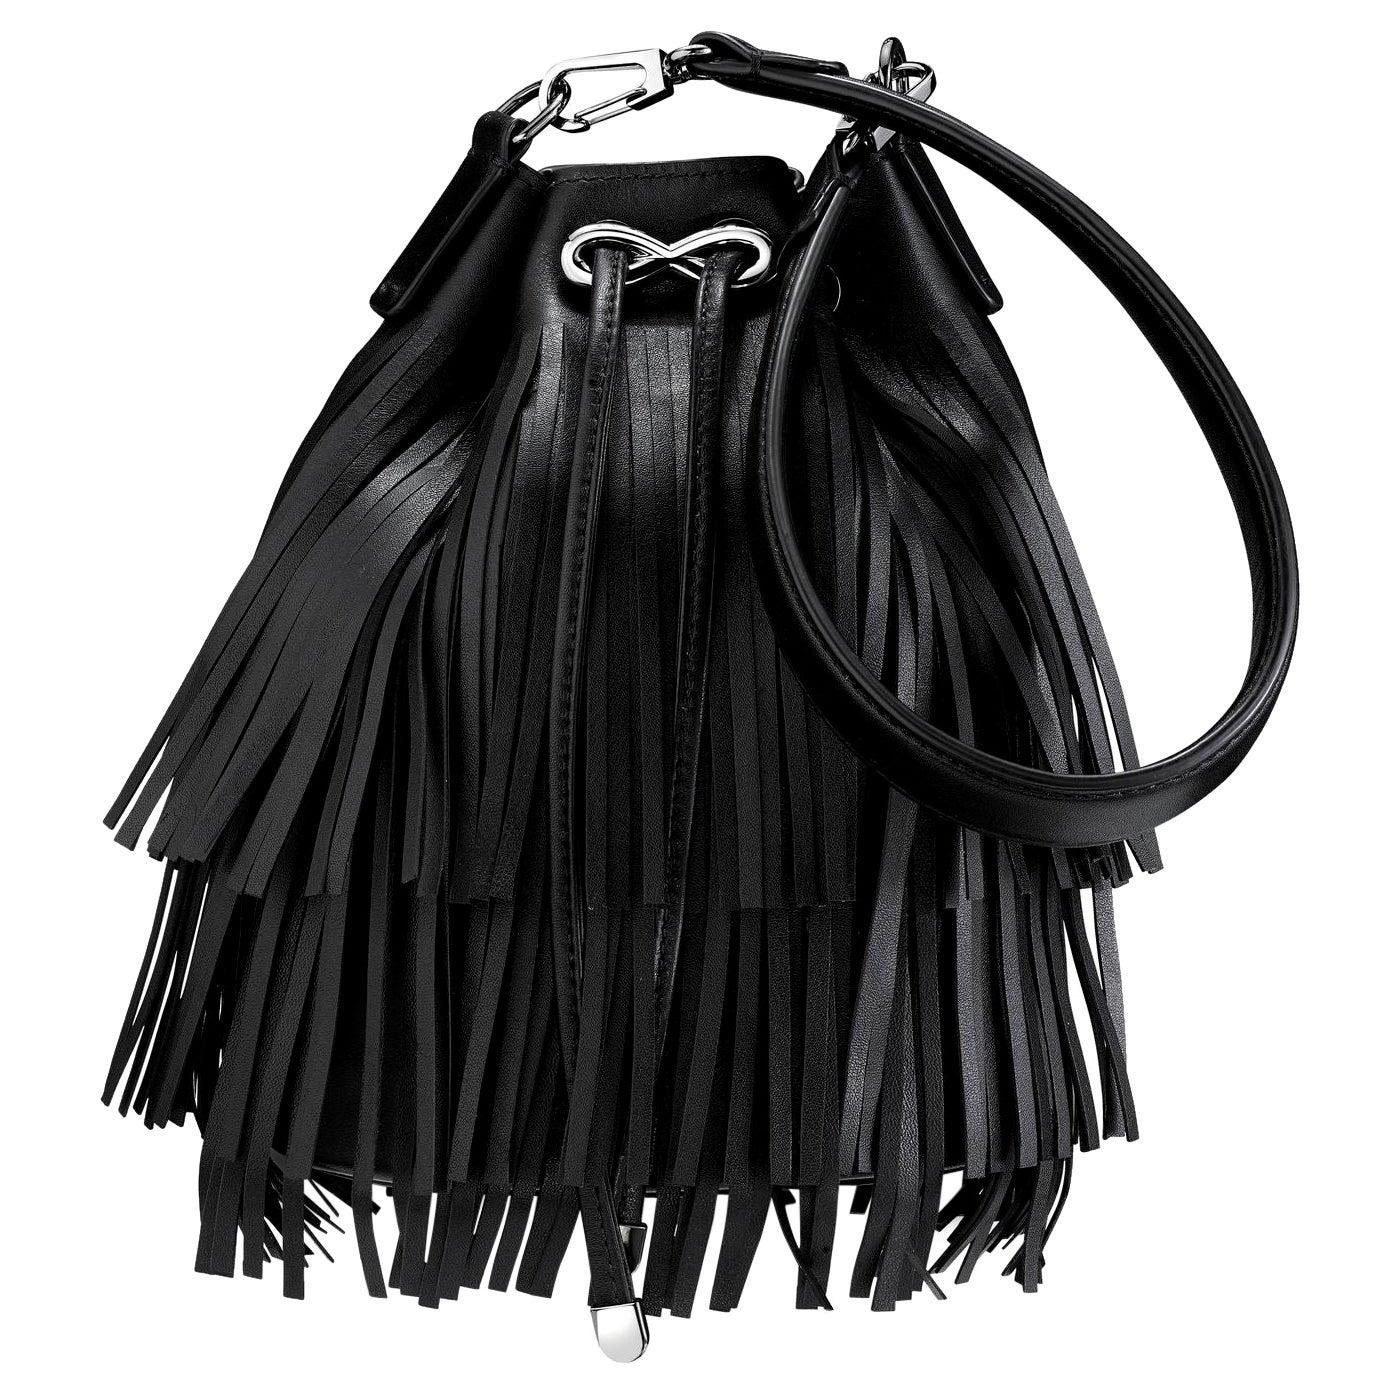 TYLER ELLIS Grace Bucket in Jet Black Leather Gunmetal Hardware